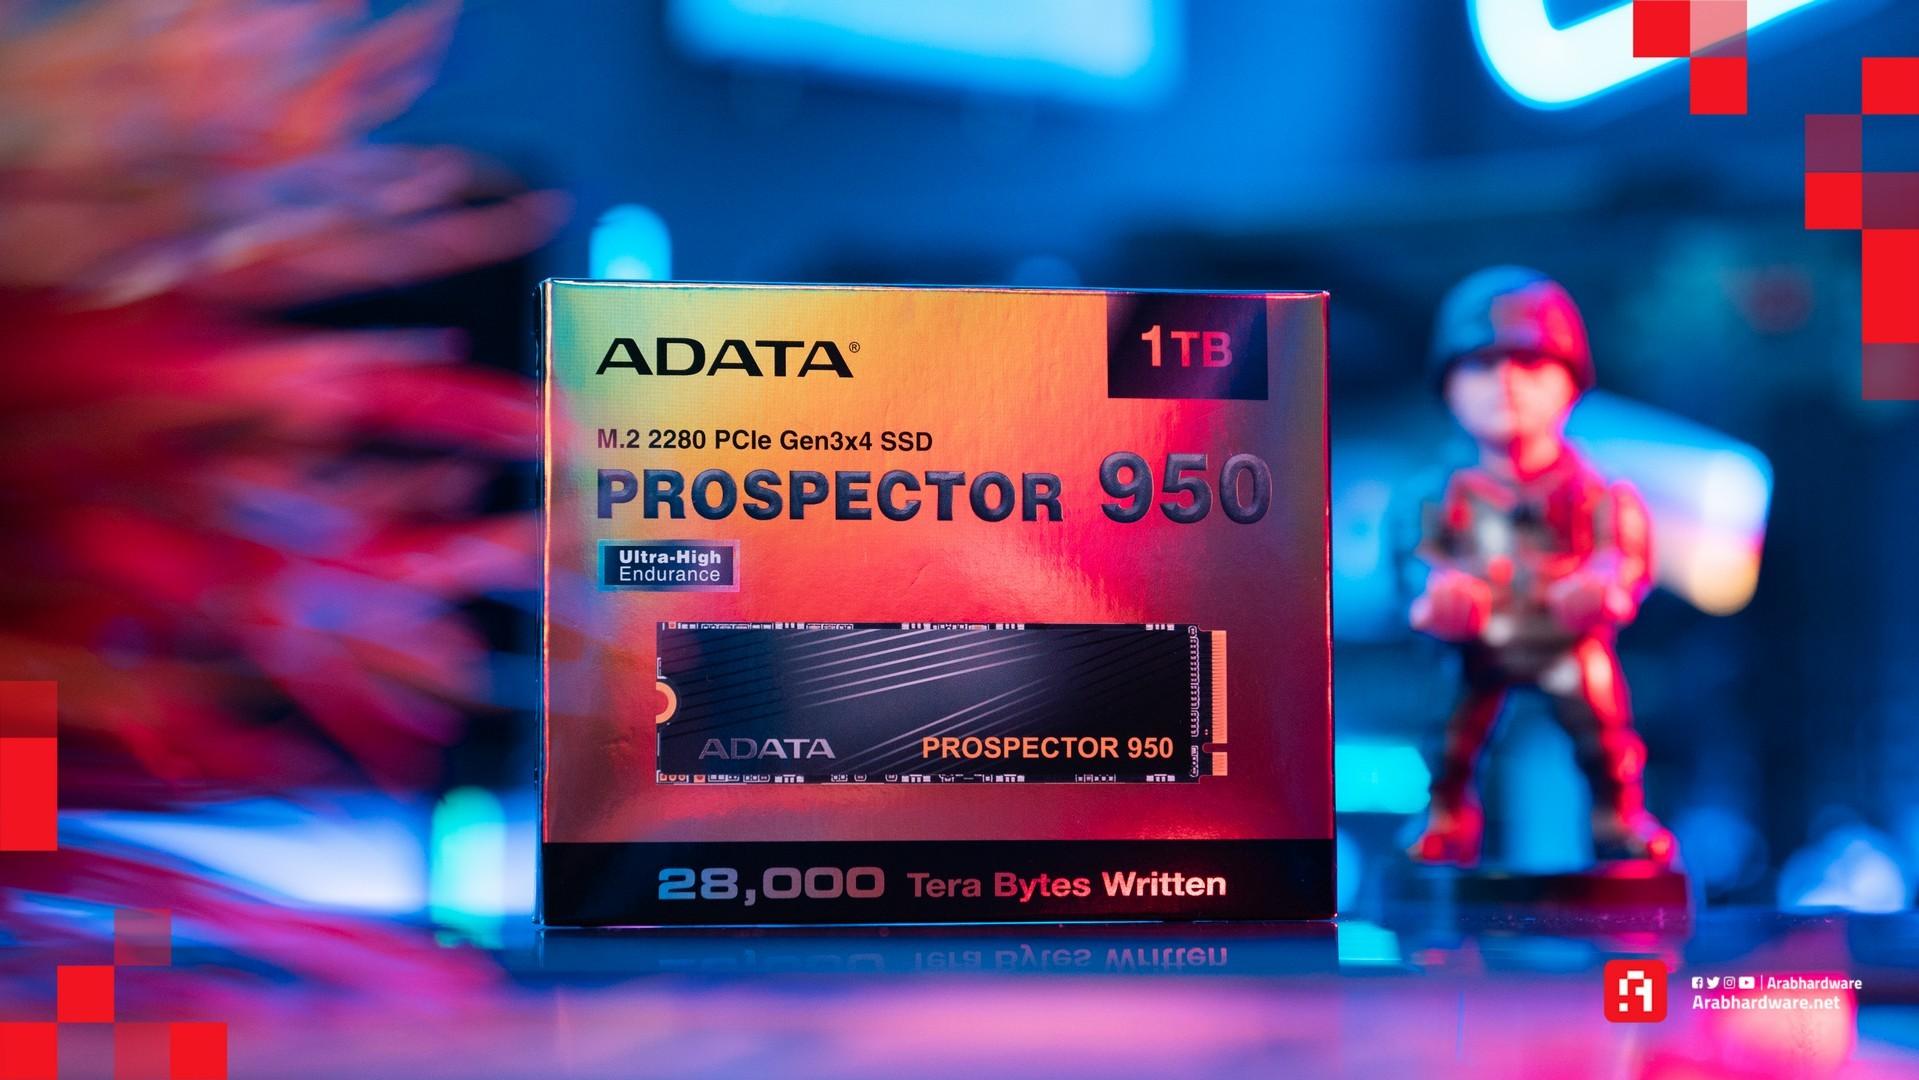 ADATA PROSPECTOR 950 SSD